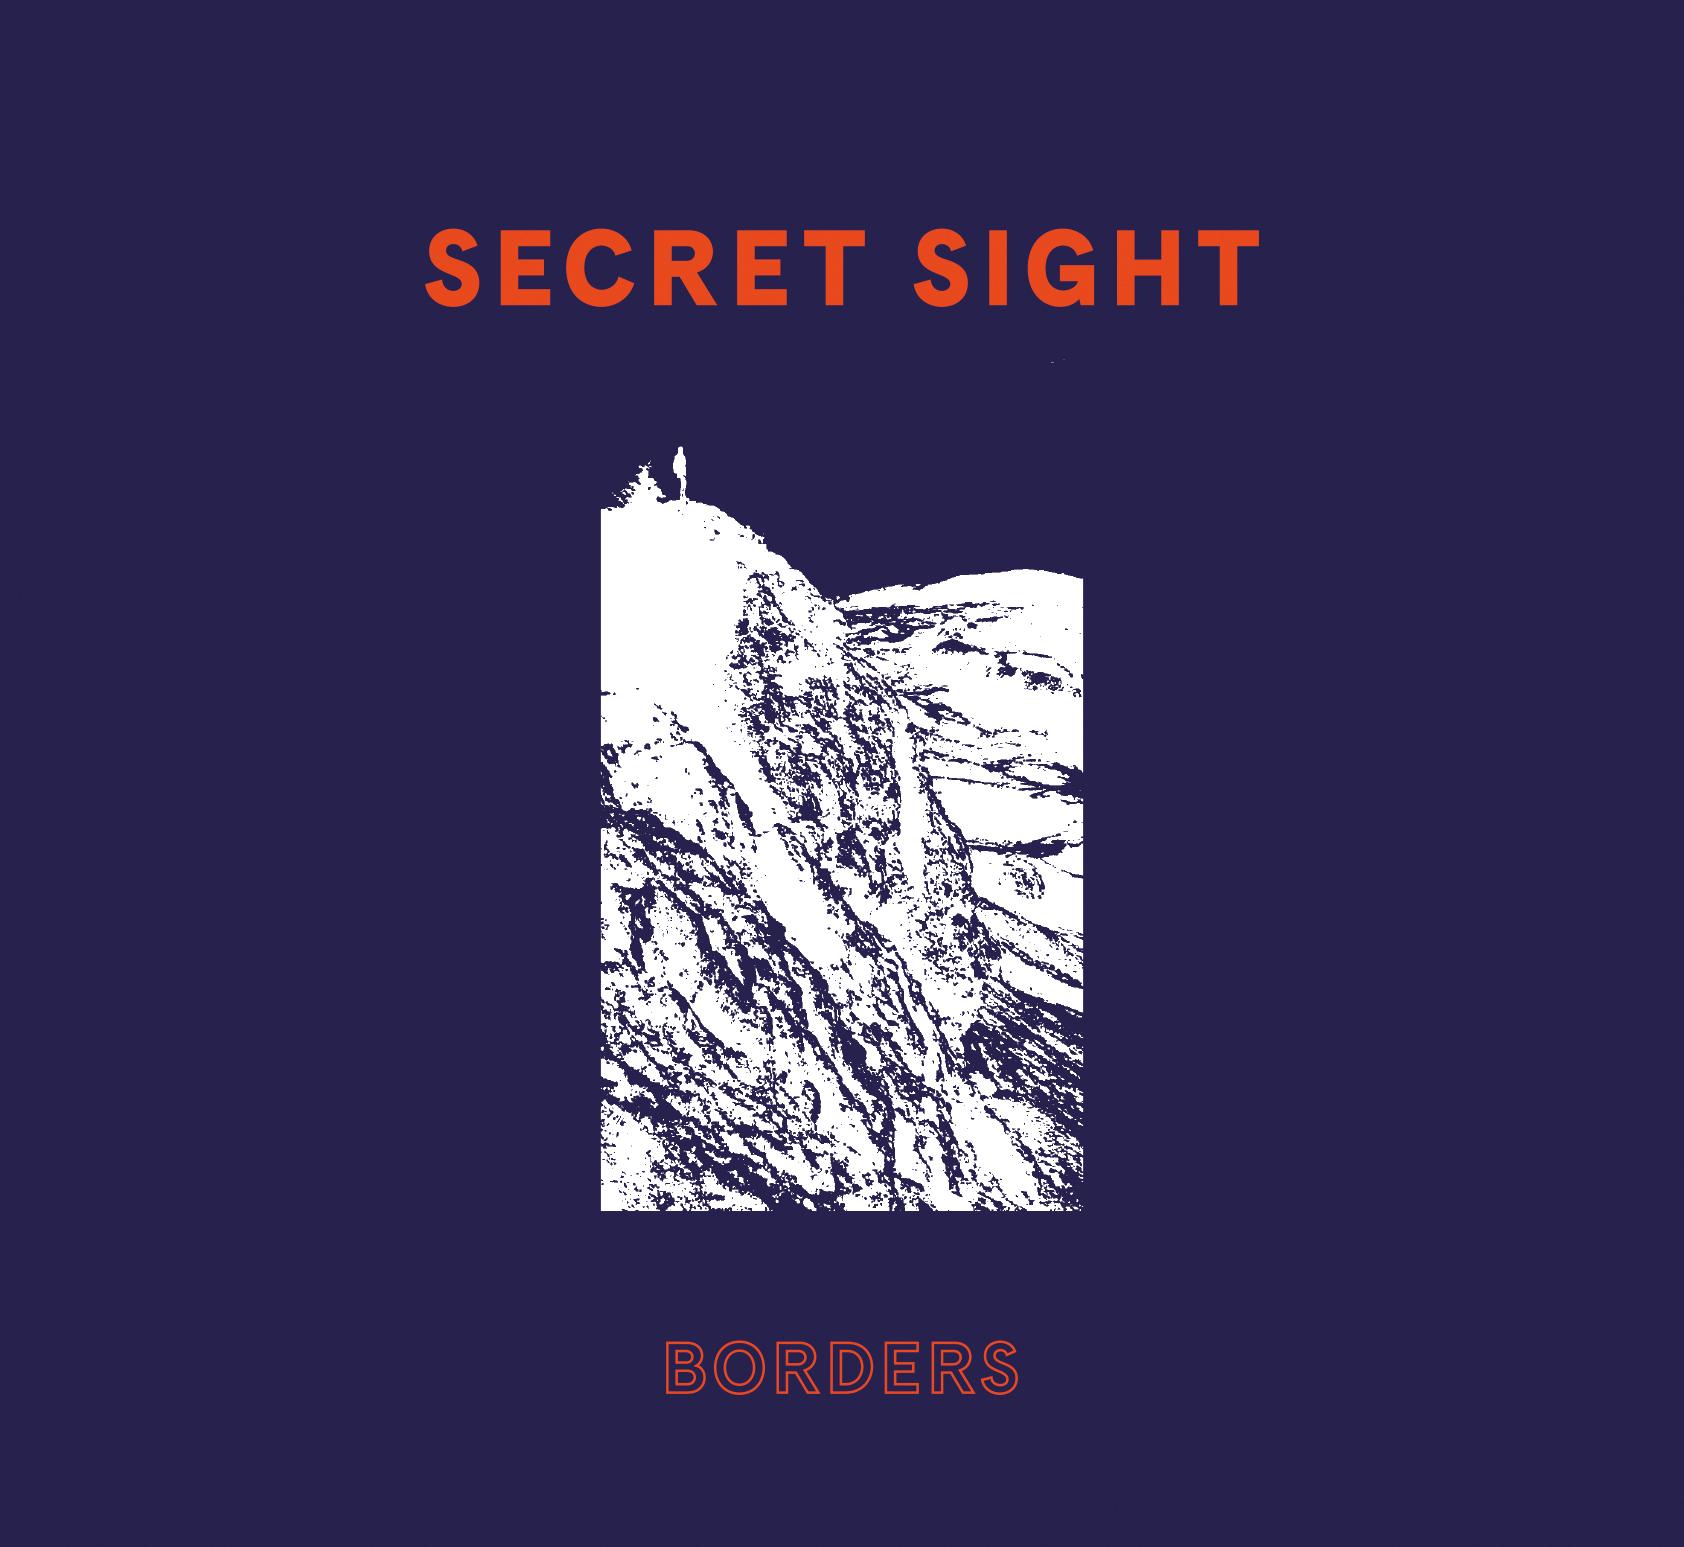 secret sigh borders